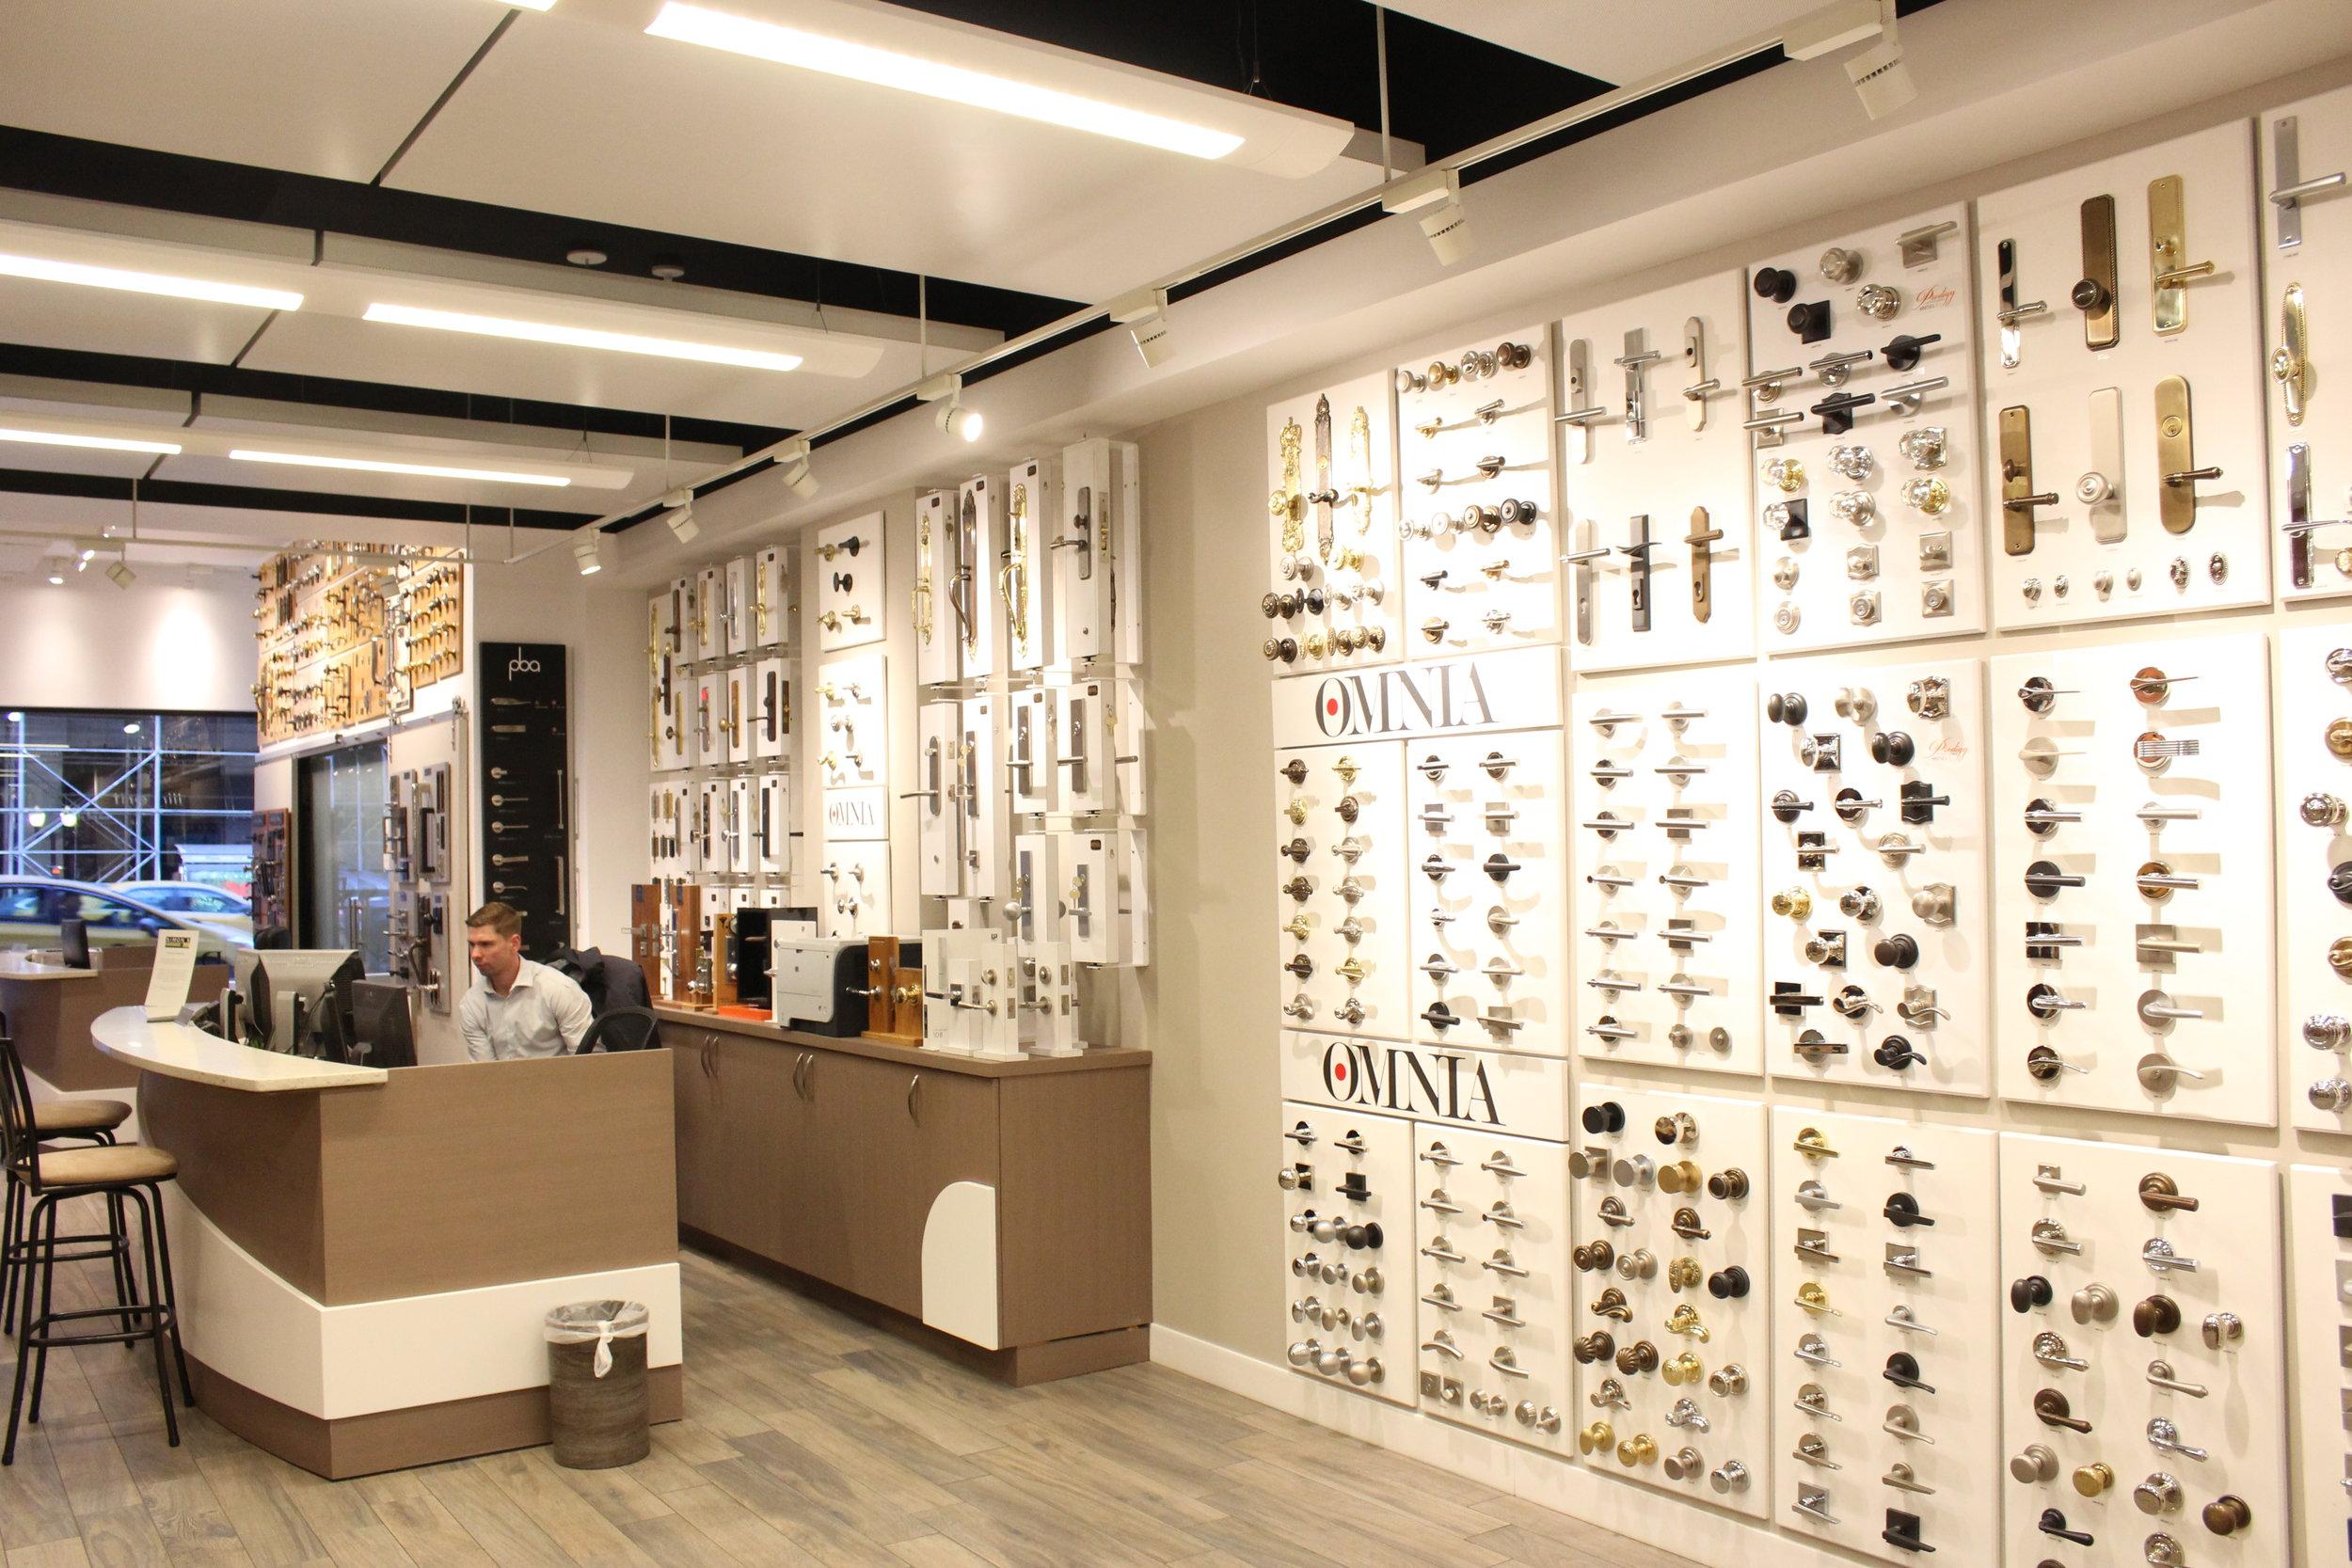 Fantastic 4 Amazing Hardware Shops In New York City Download Free Architecture Designs Scobabritishbridgeorg